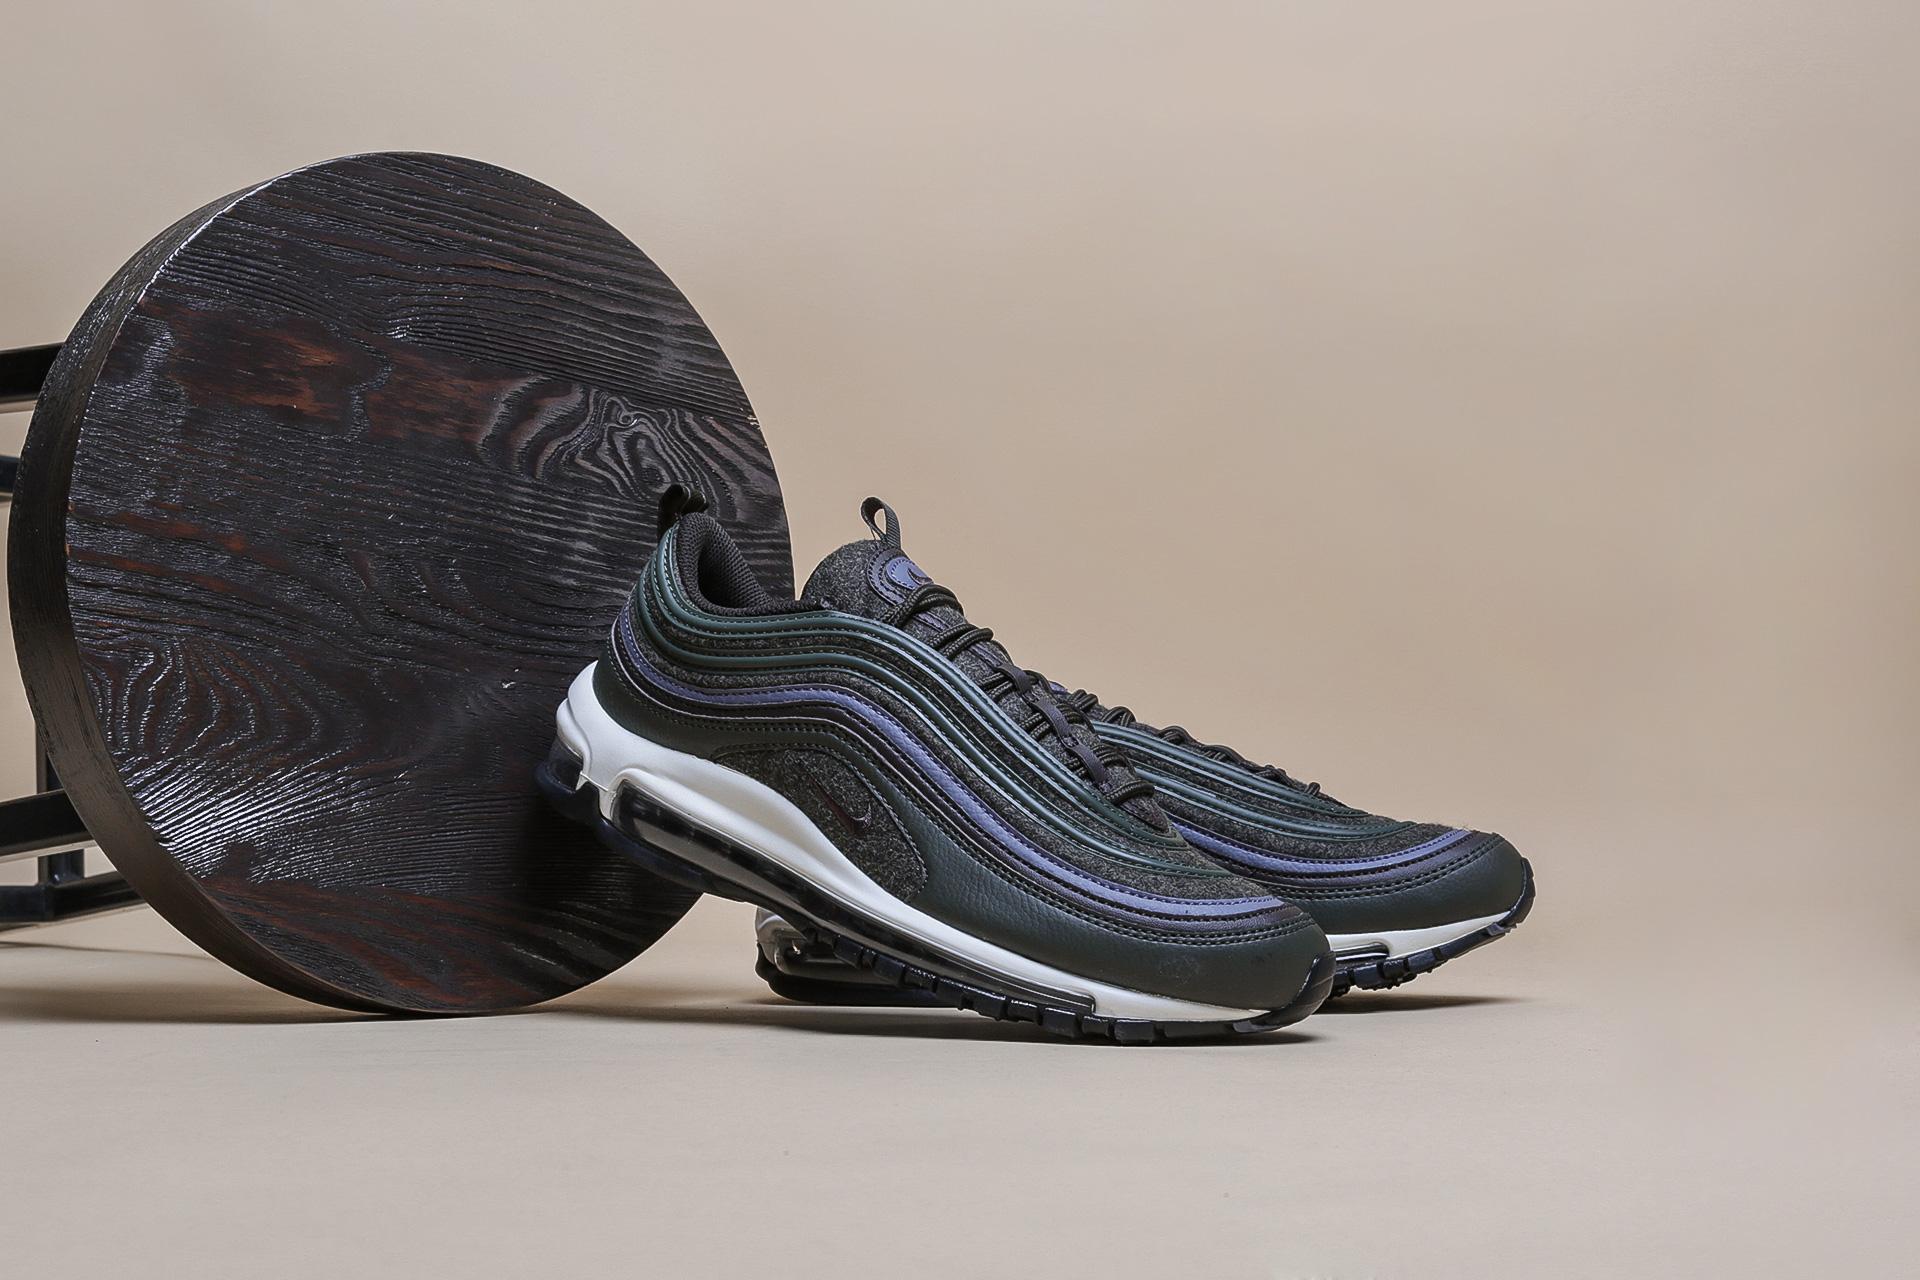 b135af94 ... Купить мужские кроссовки Nike Air Max 97 Premium - фото 2 картинки ...